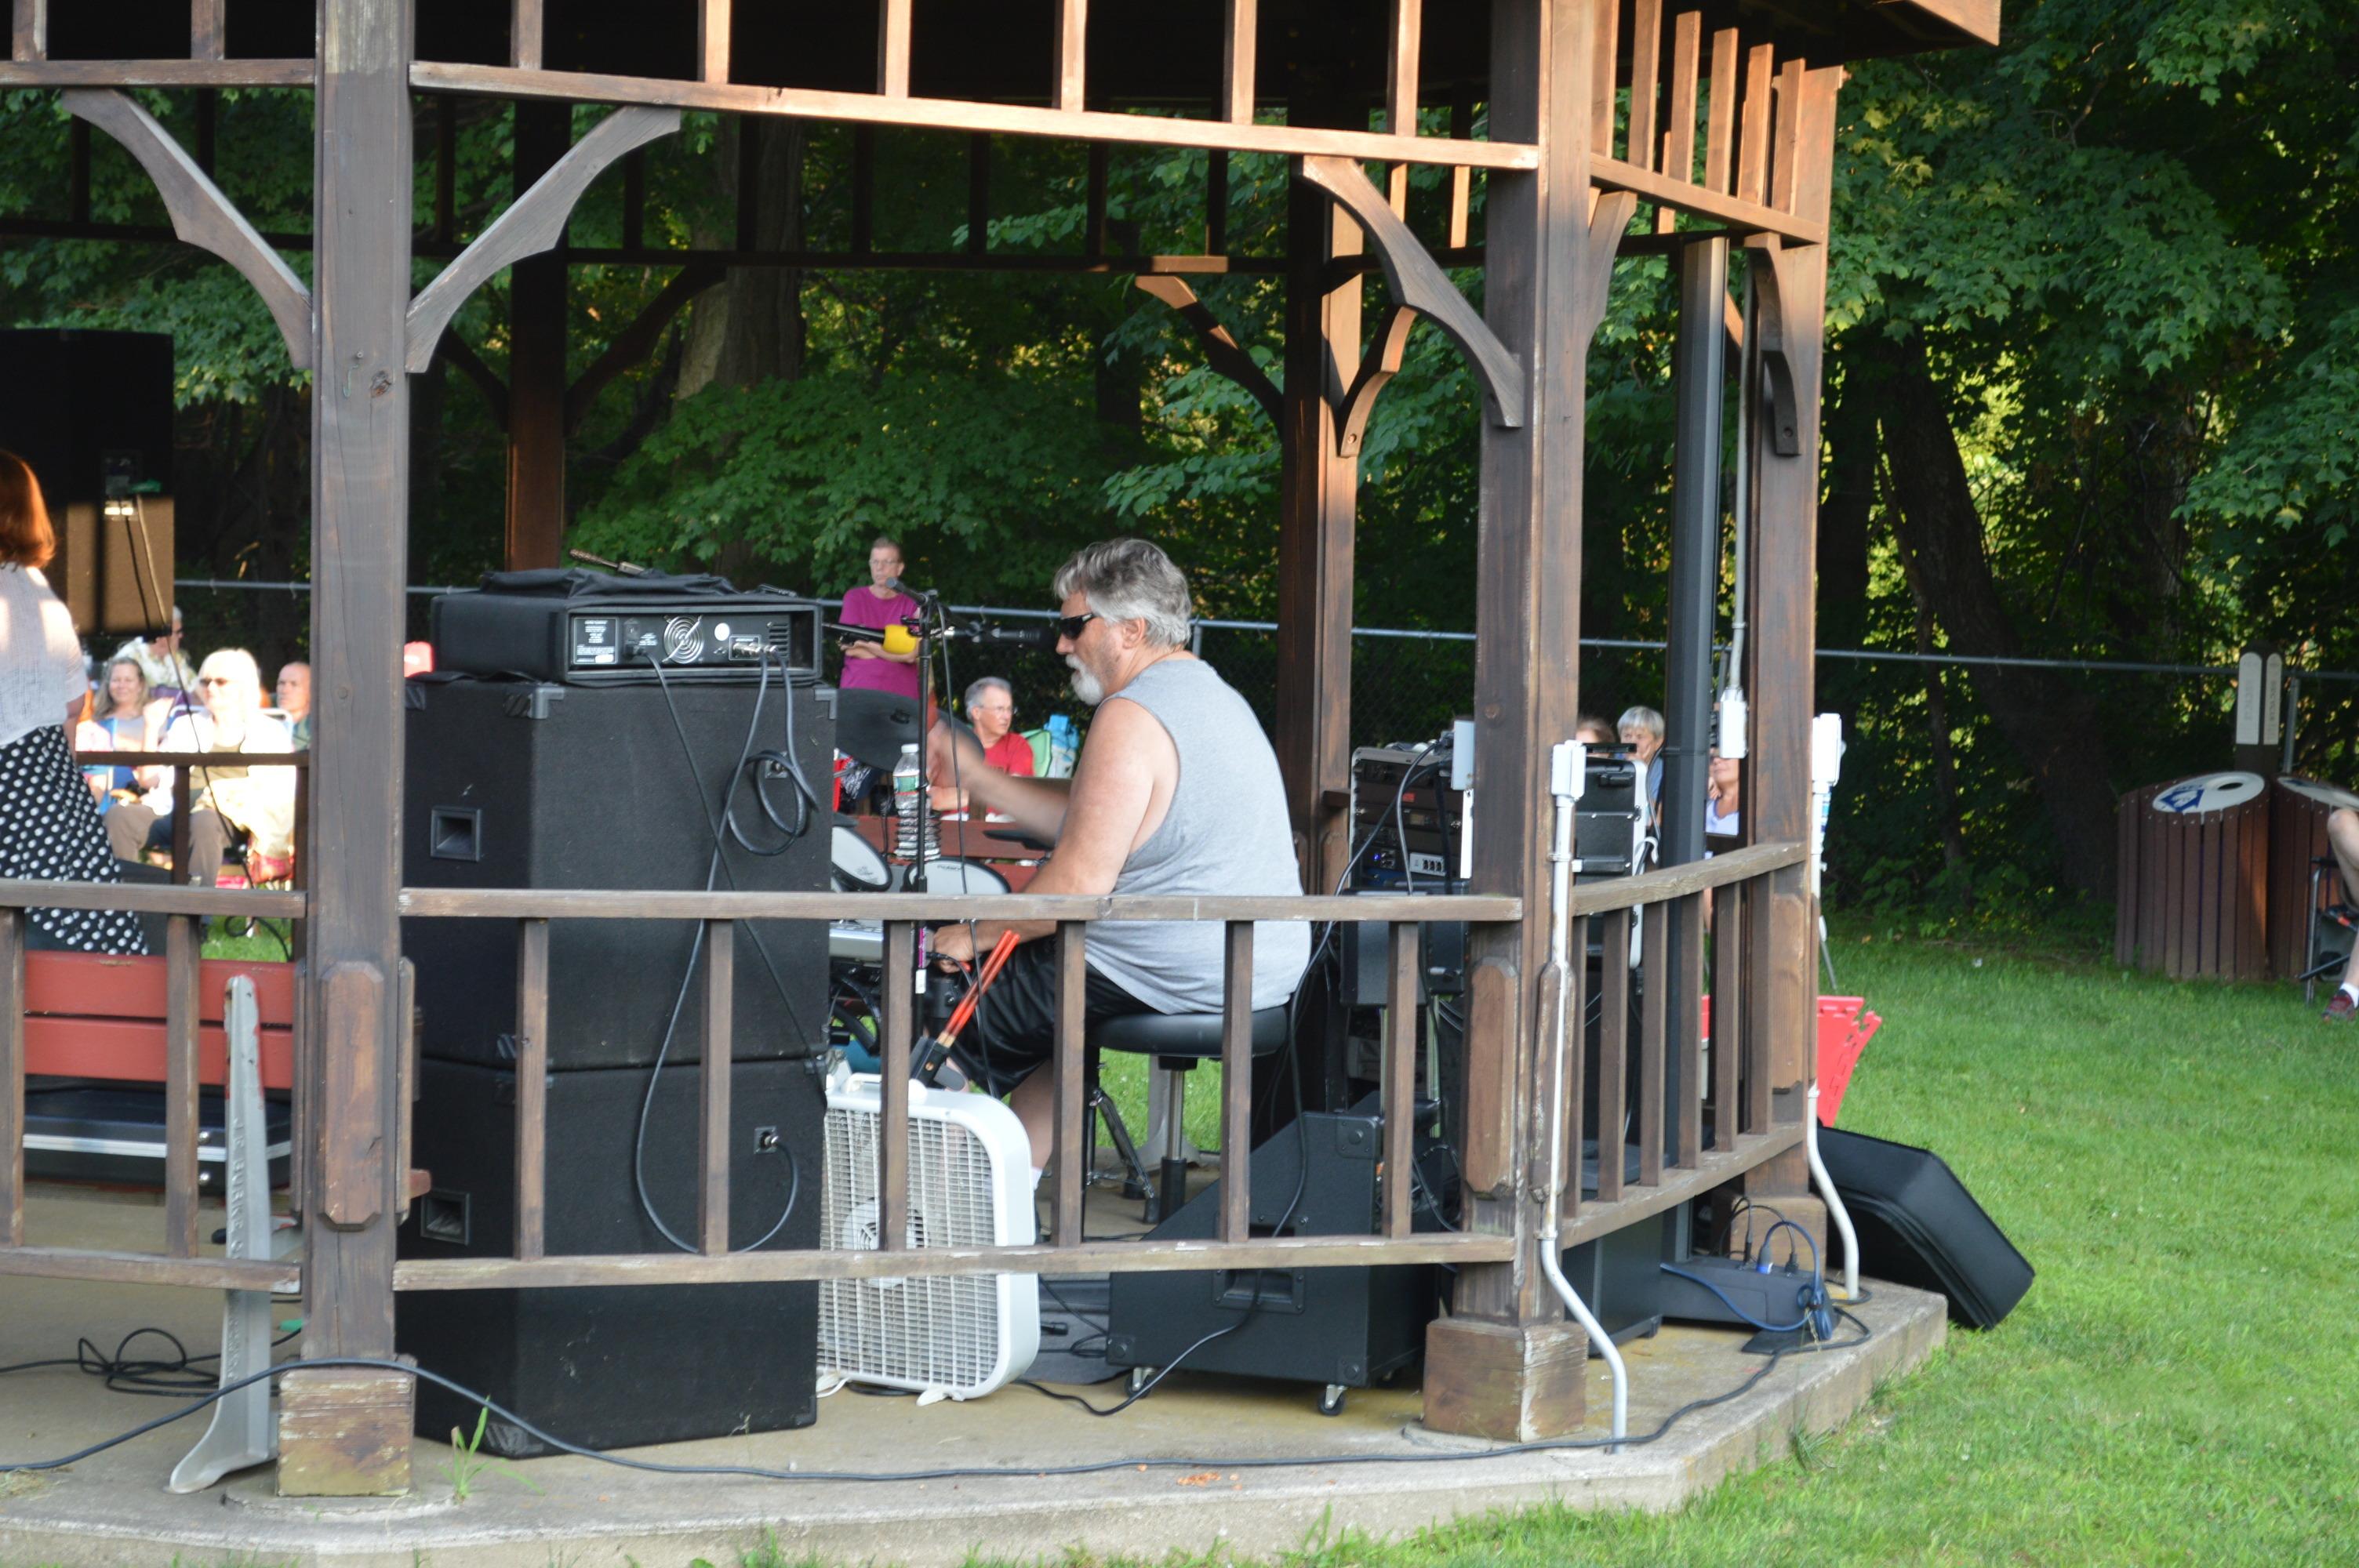 no surrender rocks summer concert series at randolph library